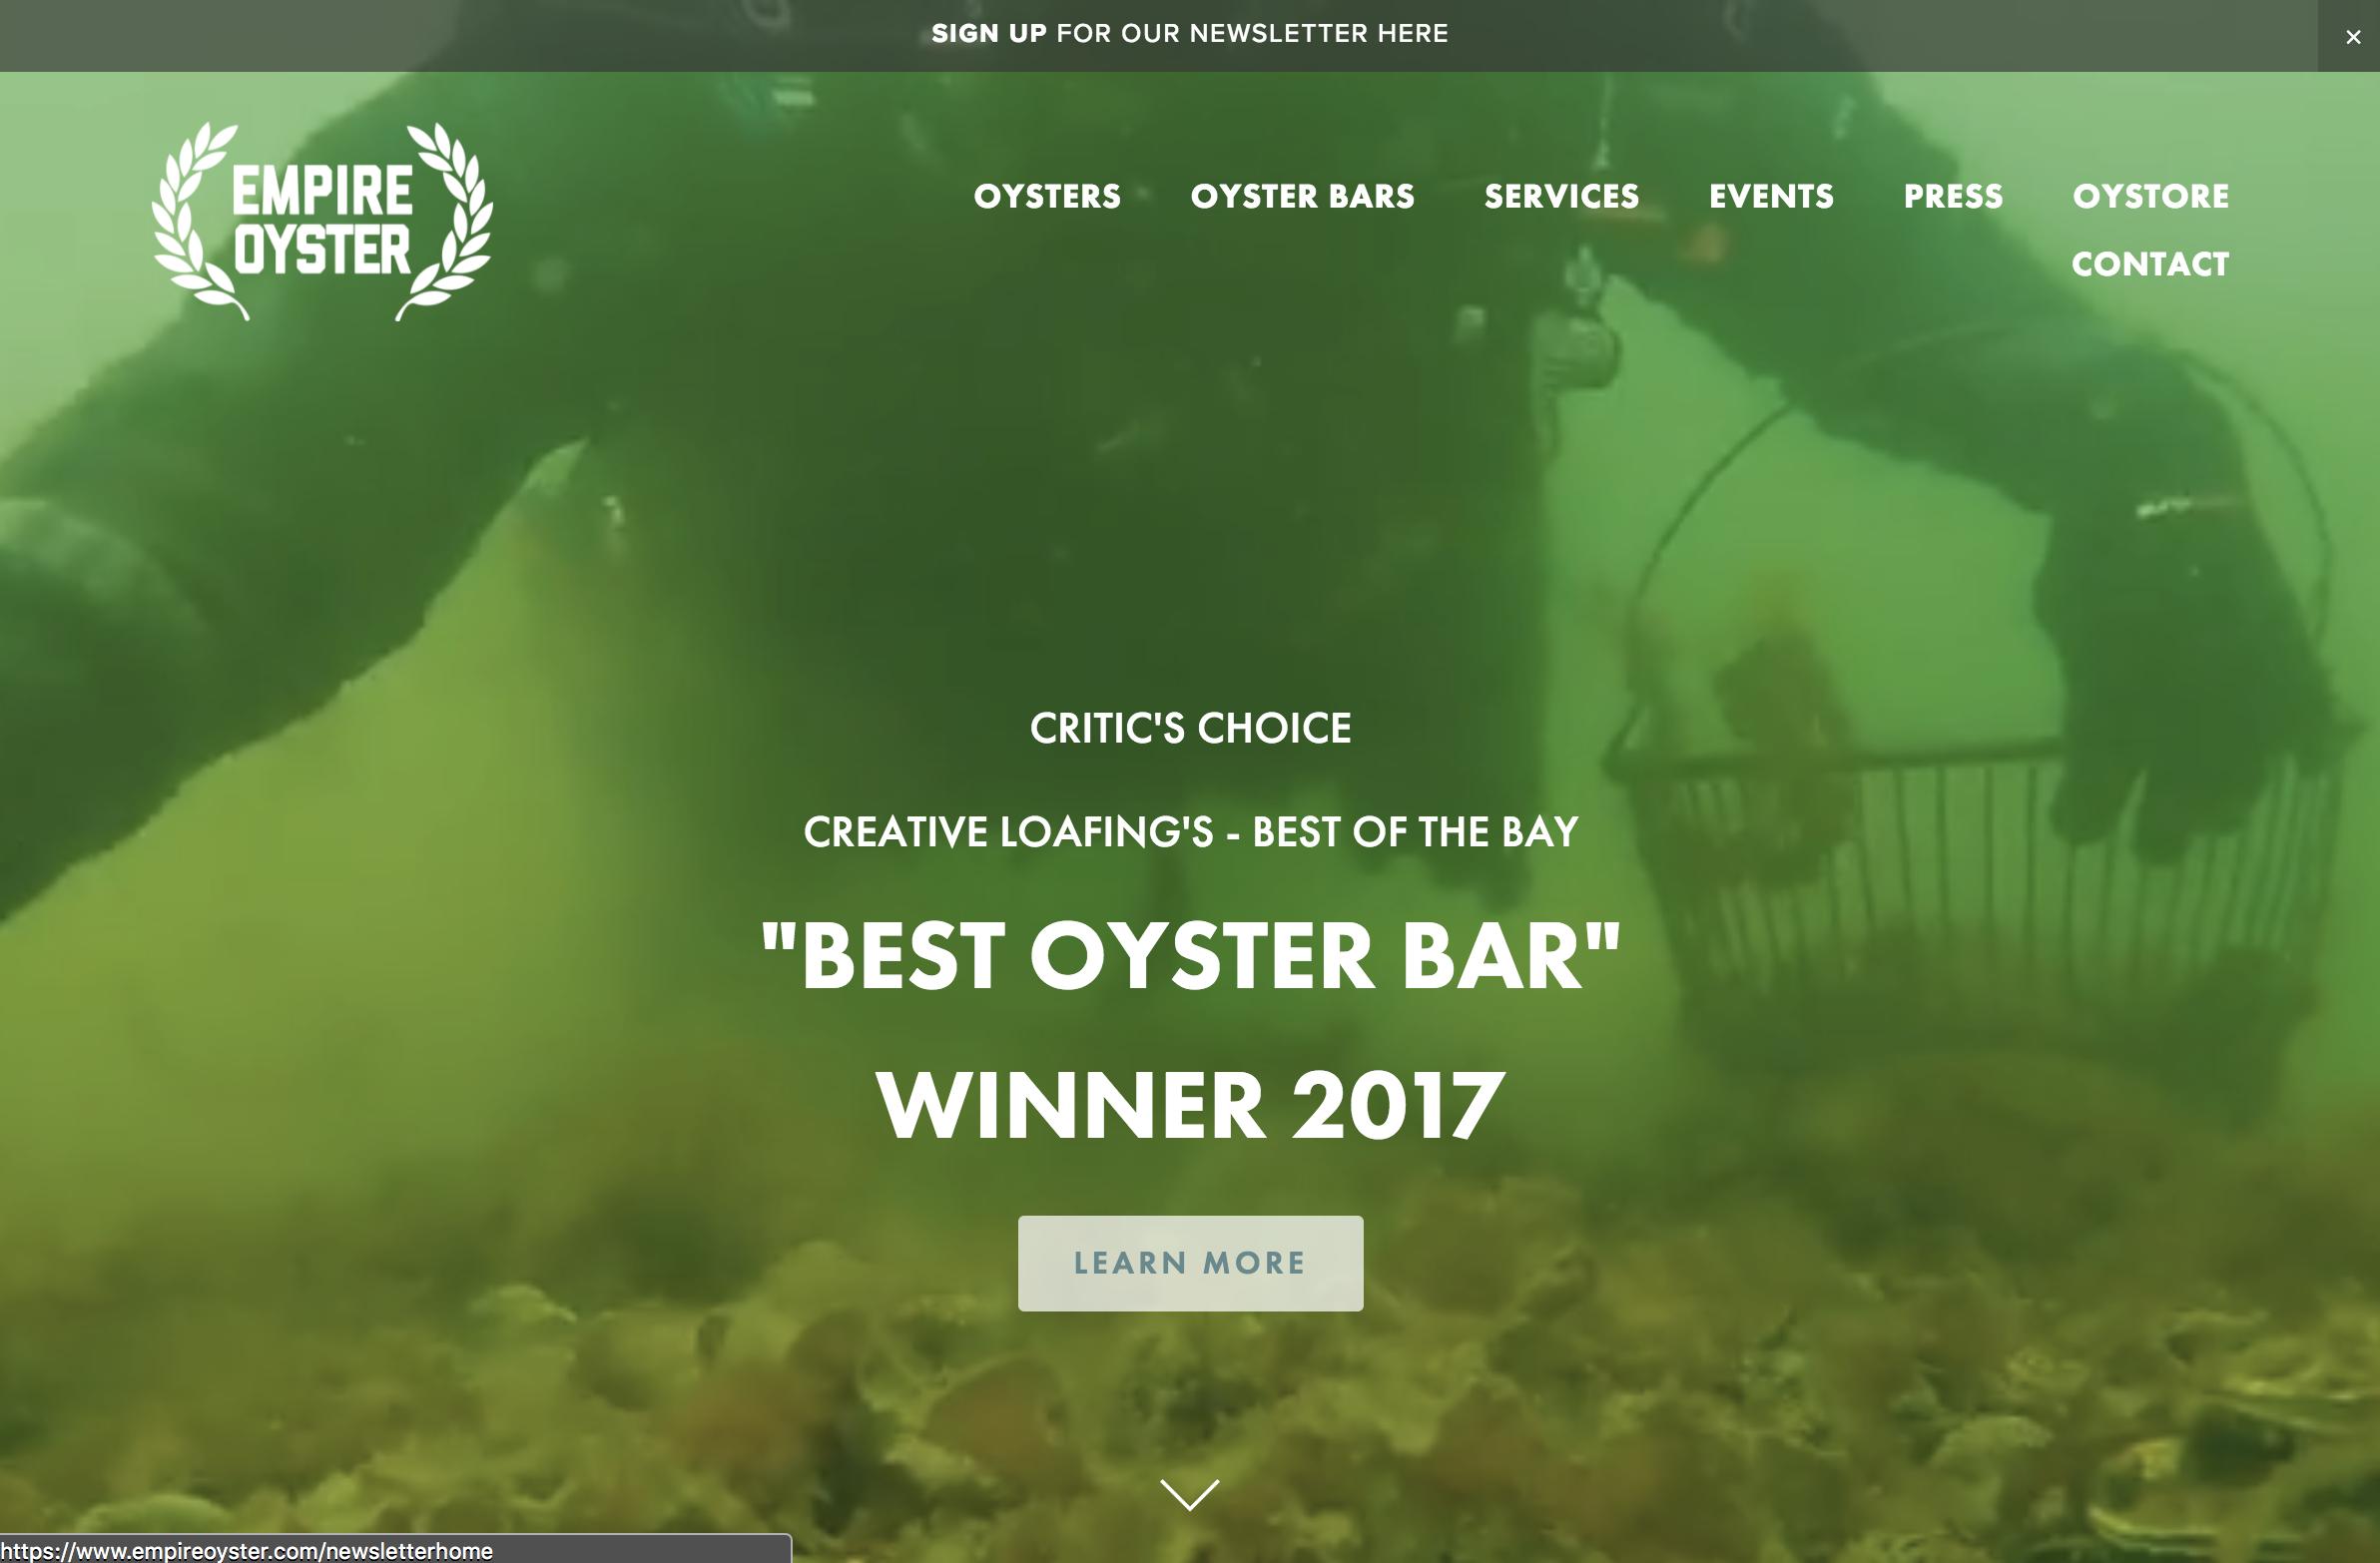 www.EmpireOyster.com